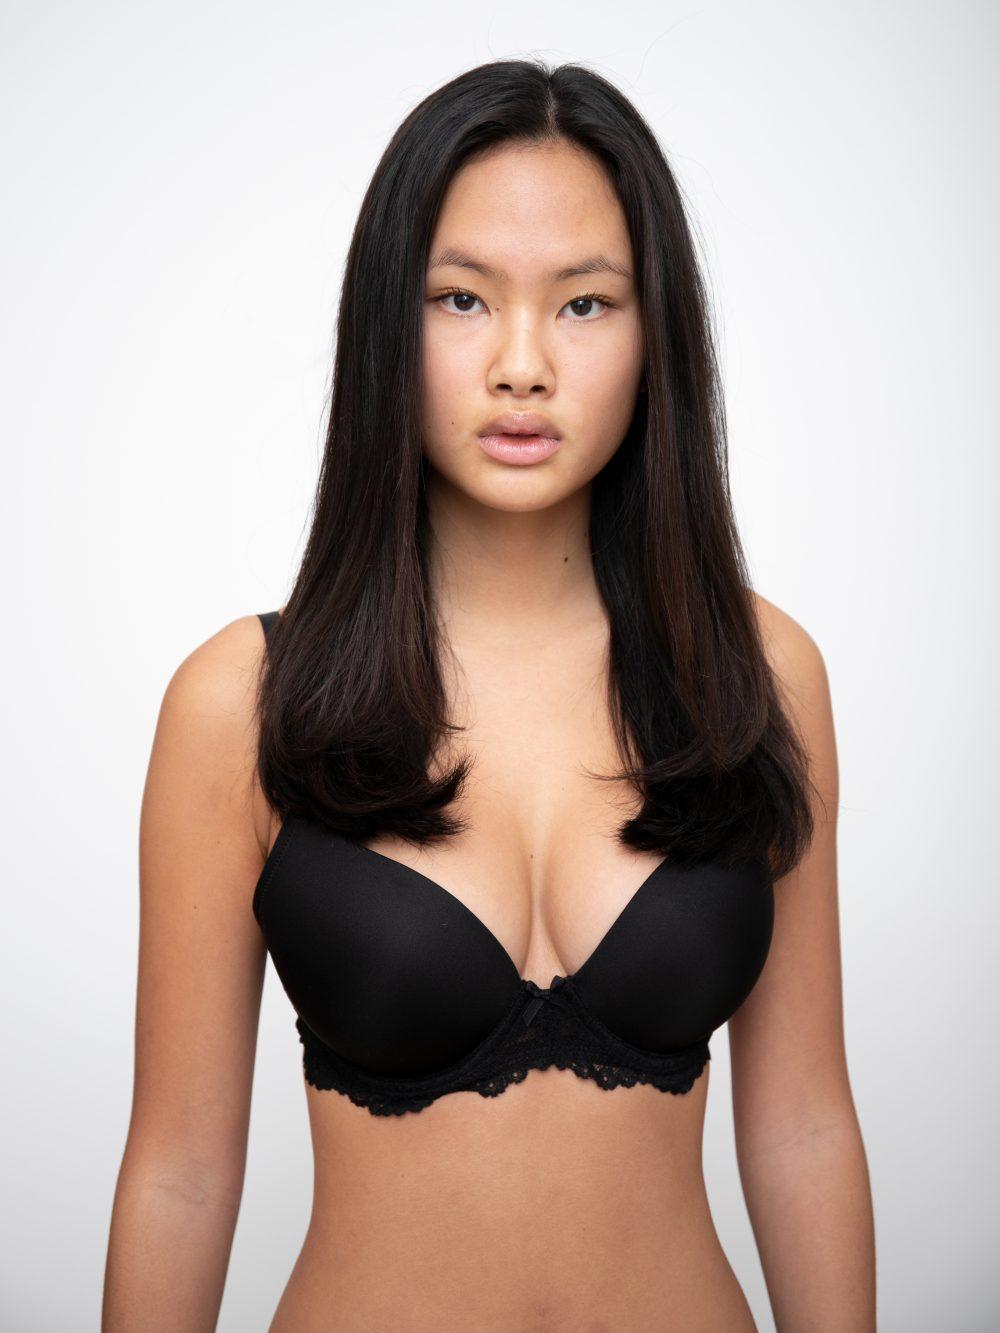 Mai Linh Bad Gögging